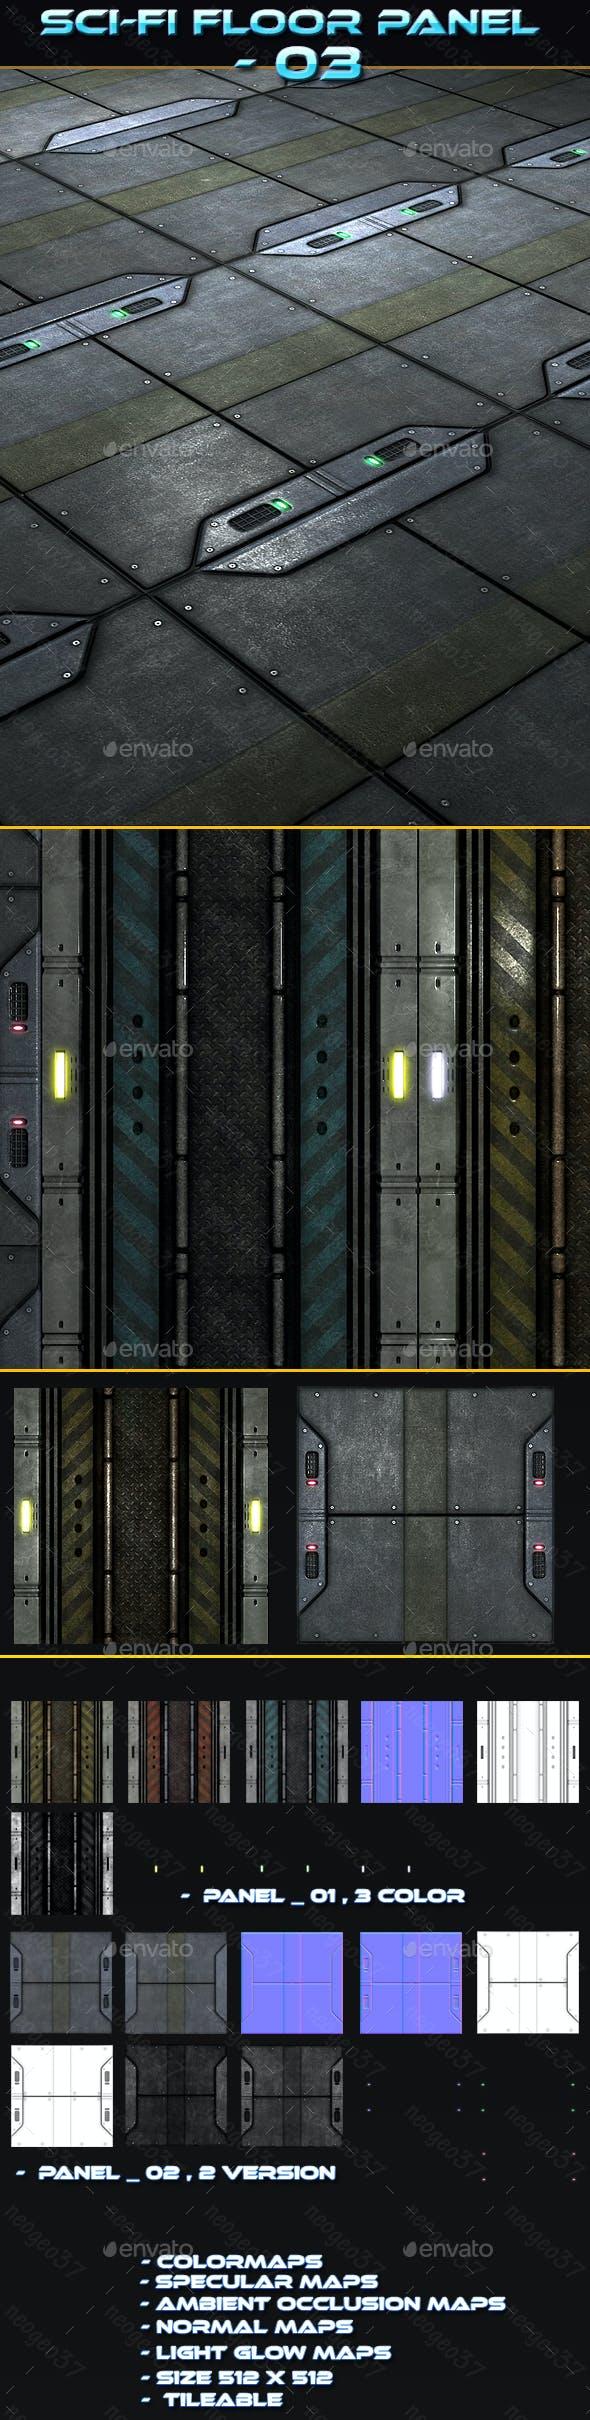 Sci-fi Floor Panel 03 - 3DOcean Item for Sale